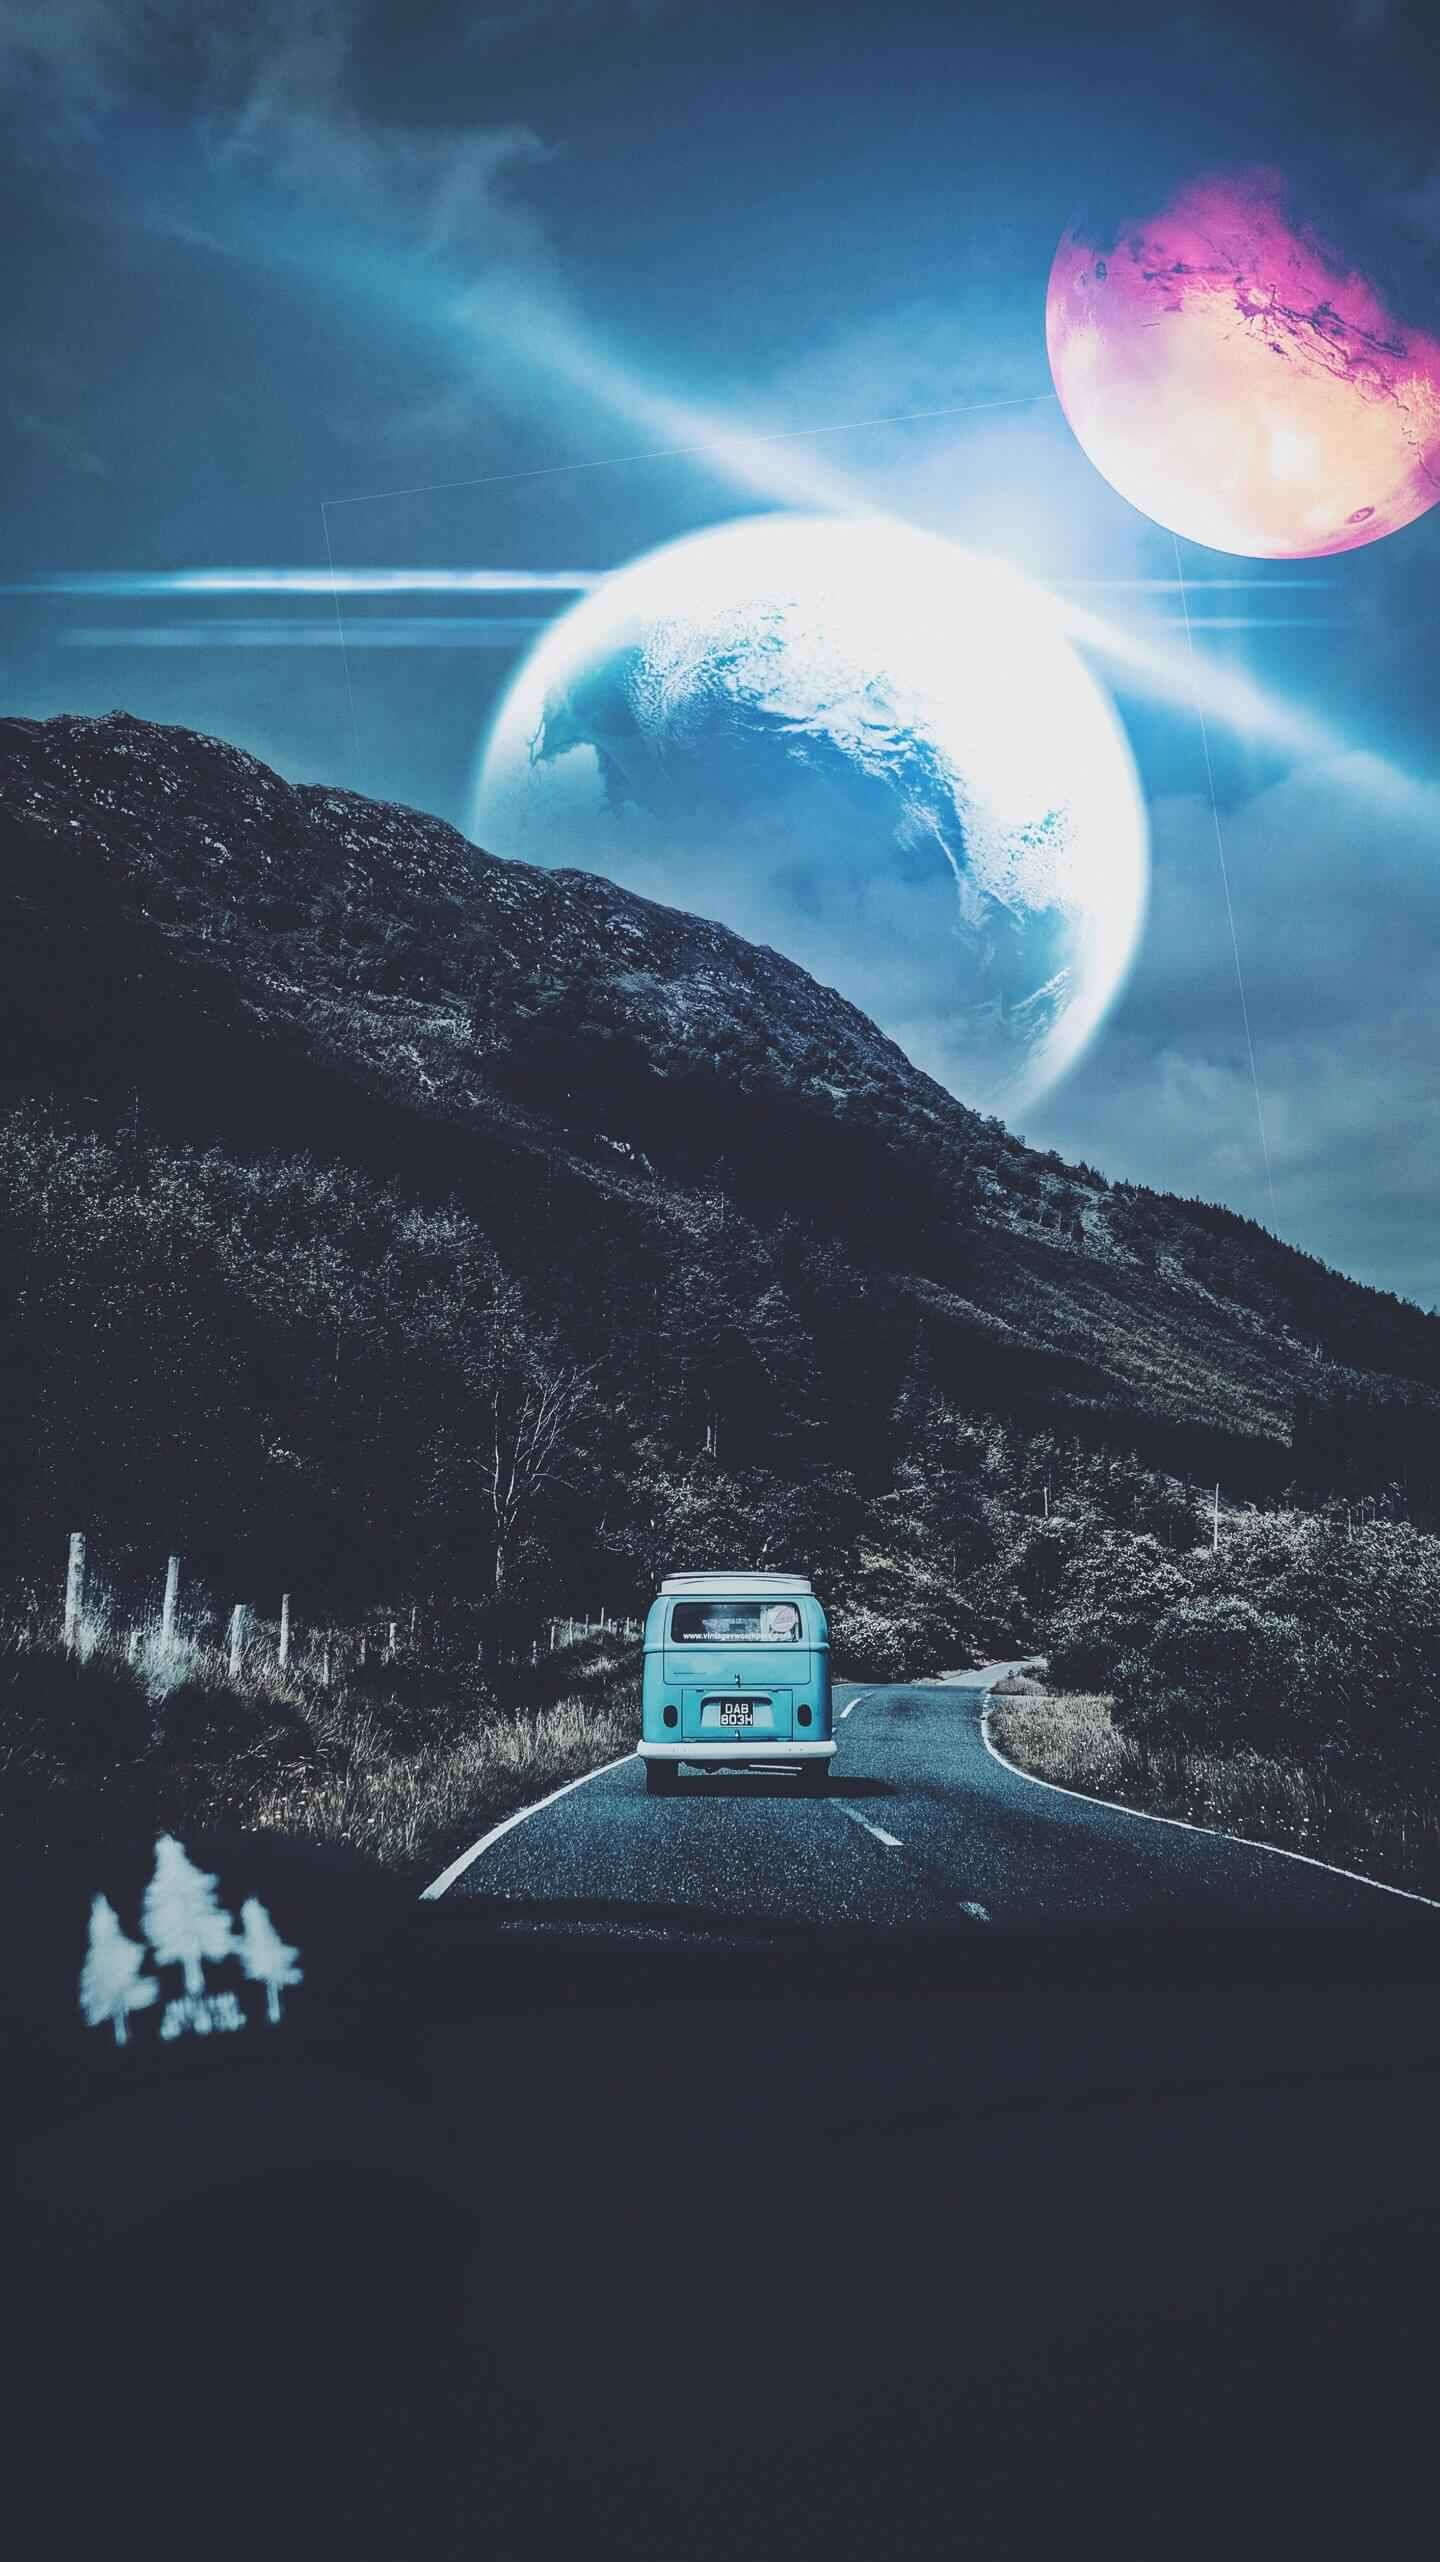 Roadtrip Adventures iPhone Wallpaper - iPhone Wall